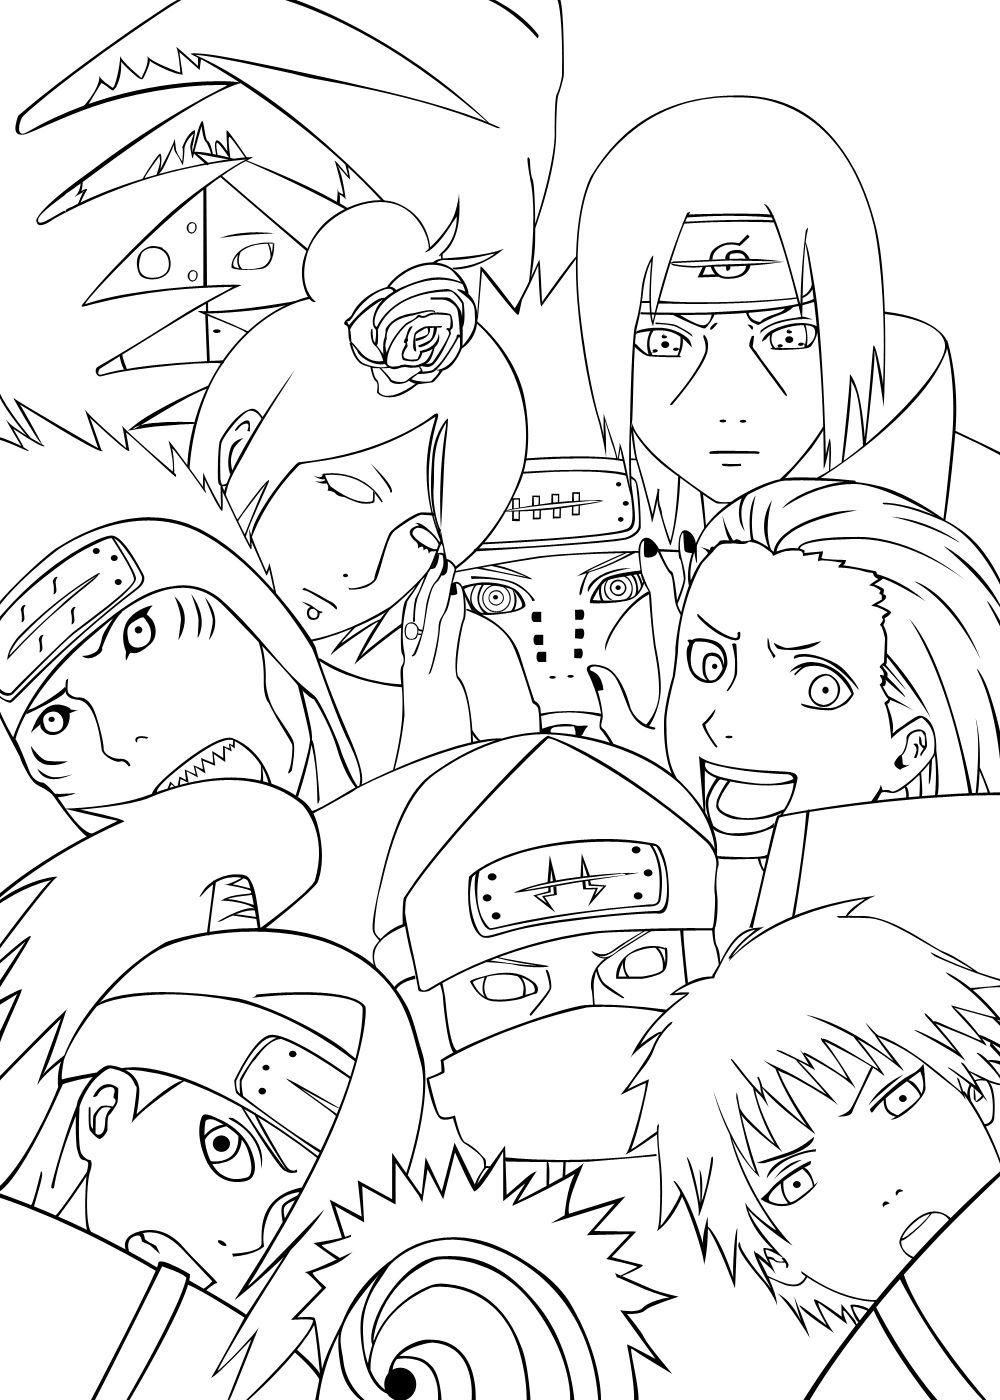 Pin von spetri auf LineArt: Naruto | Pinterest